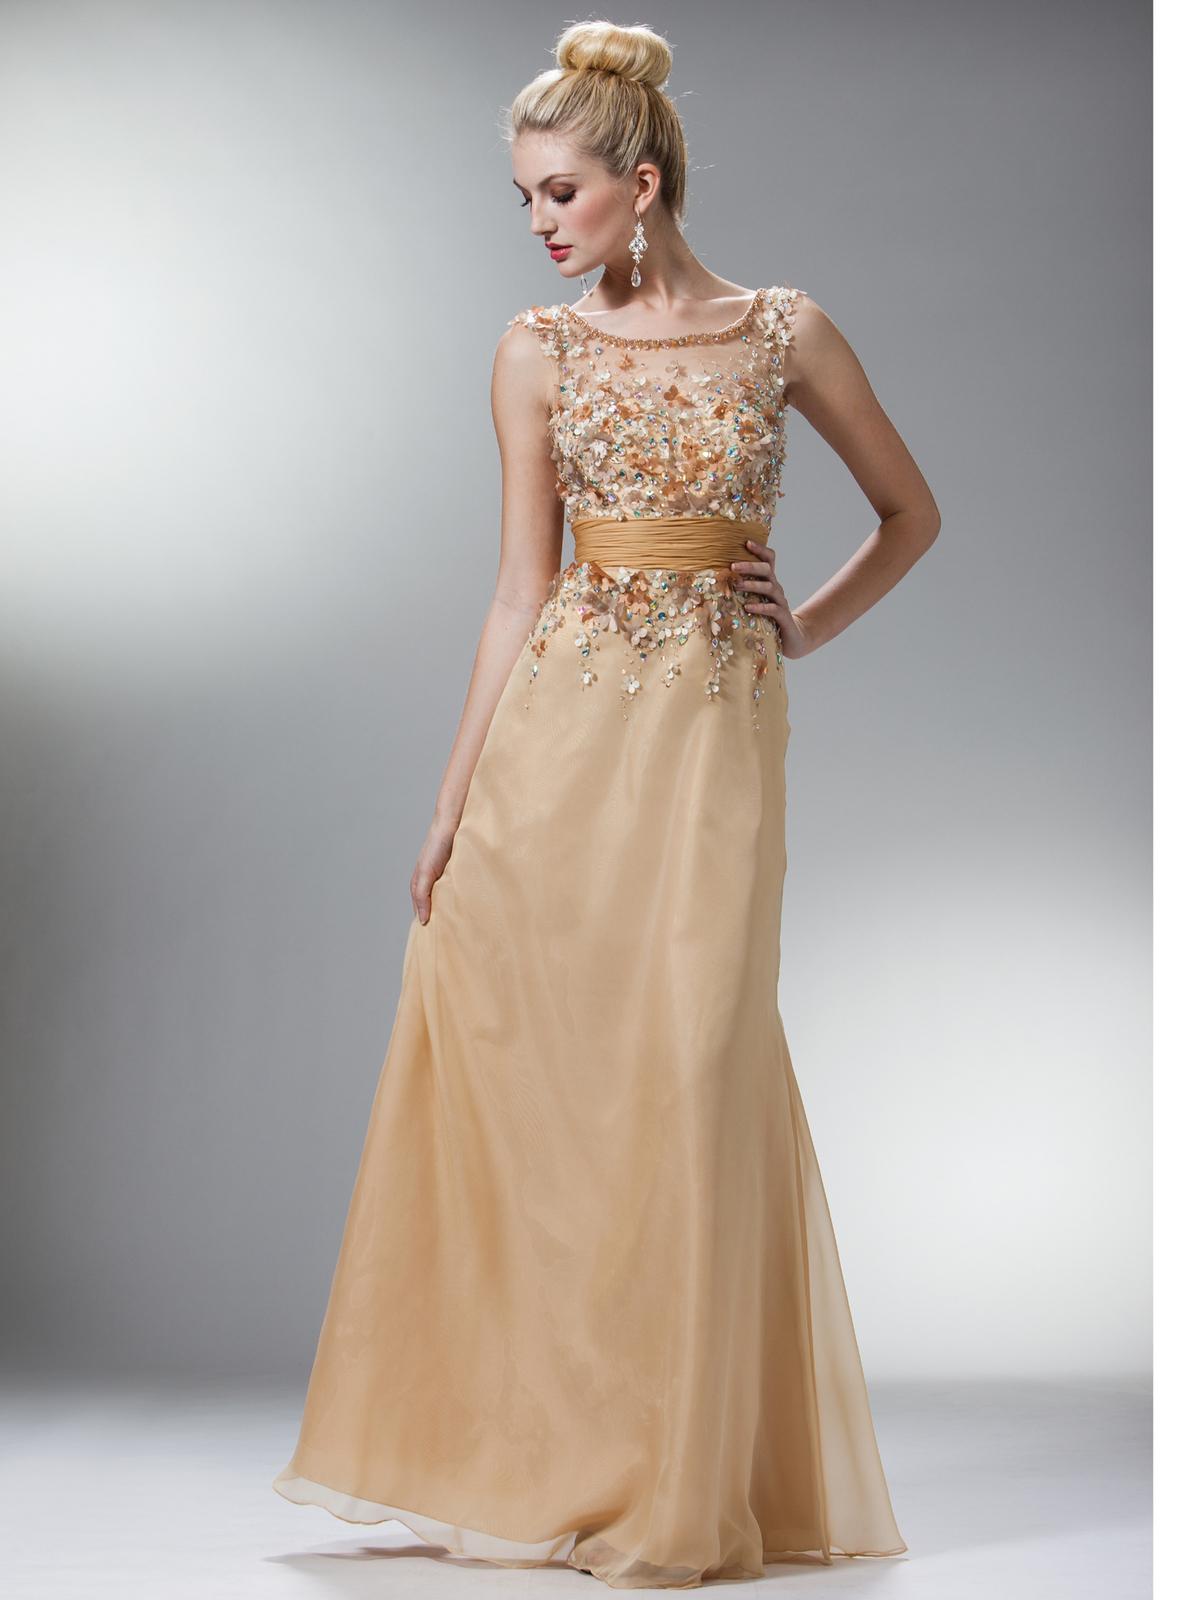 Grace Kelly Glamour Evening Dress Sung Boutique L A